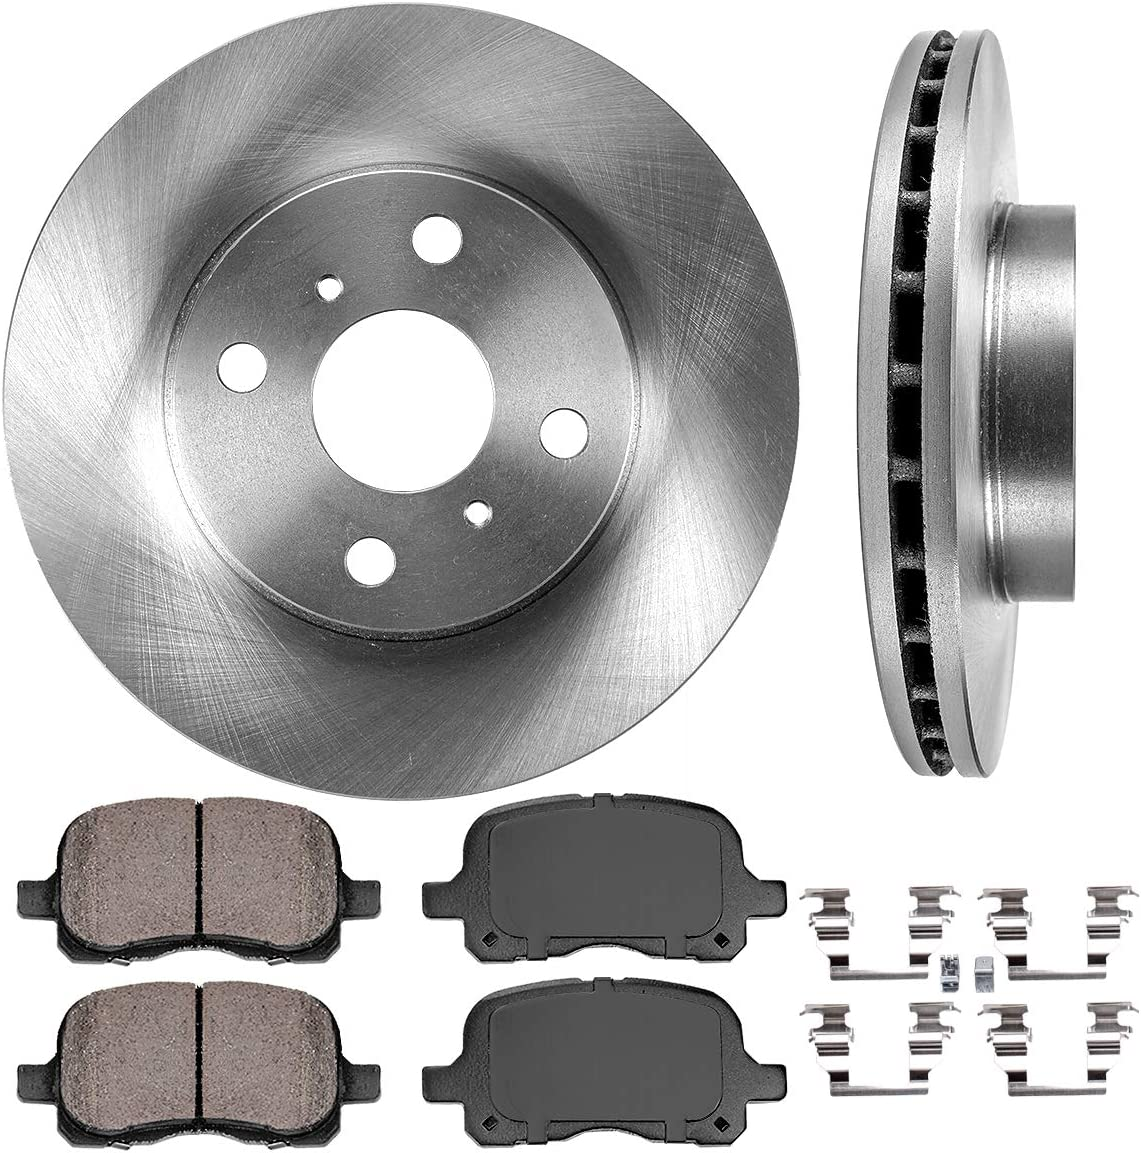 2013 Fit Toyota Corolla OE Replacement Rotors w//Metallic Pads F